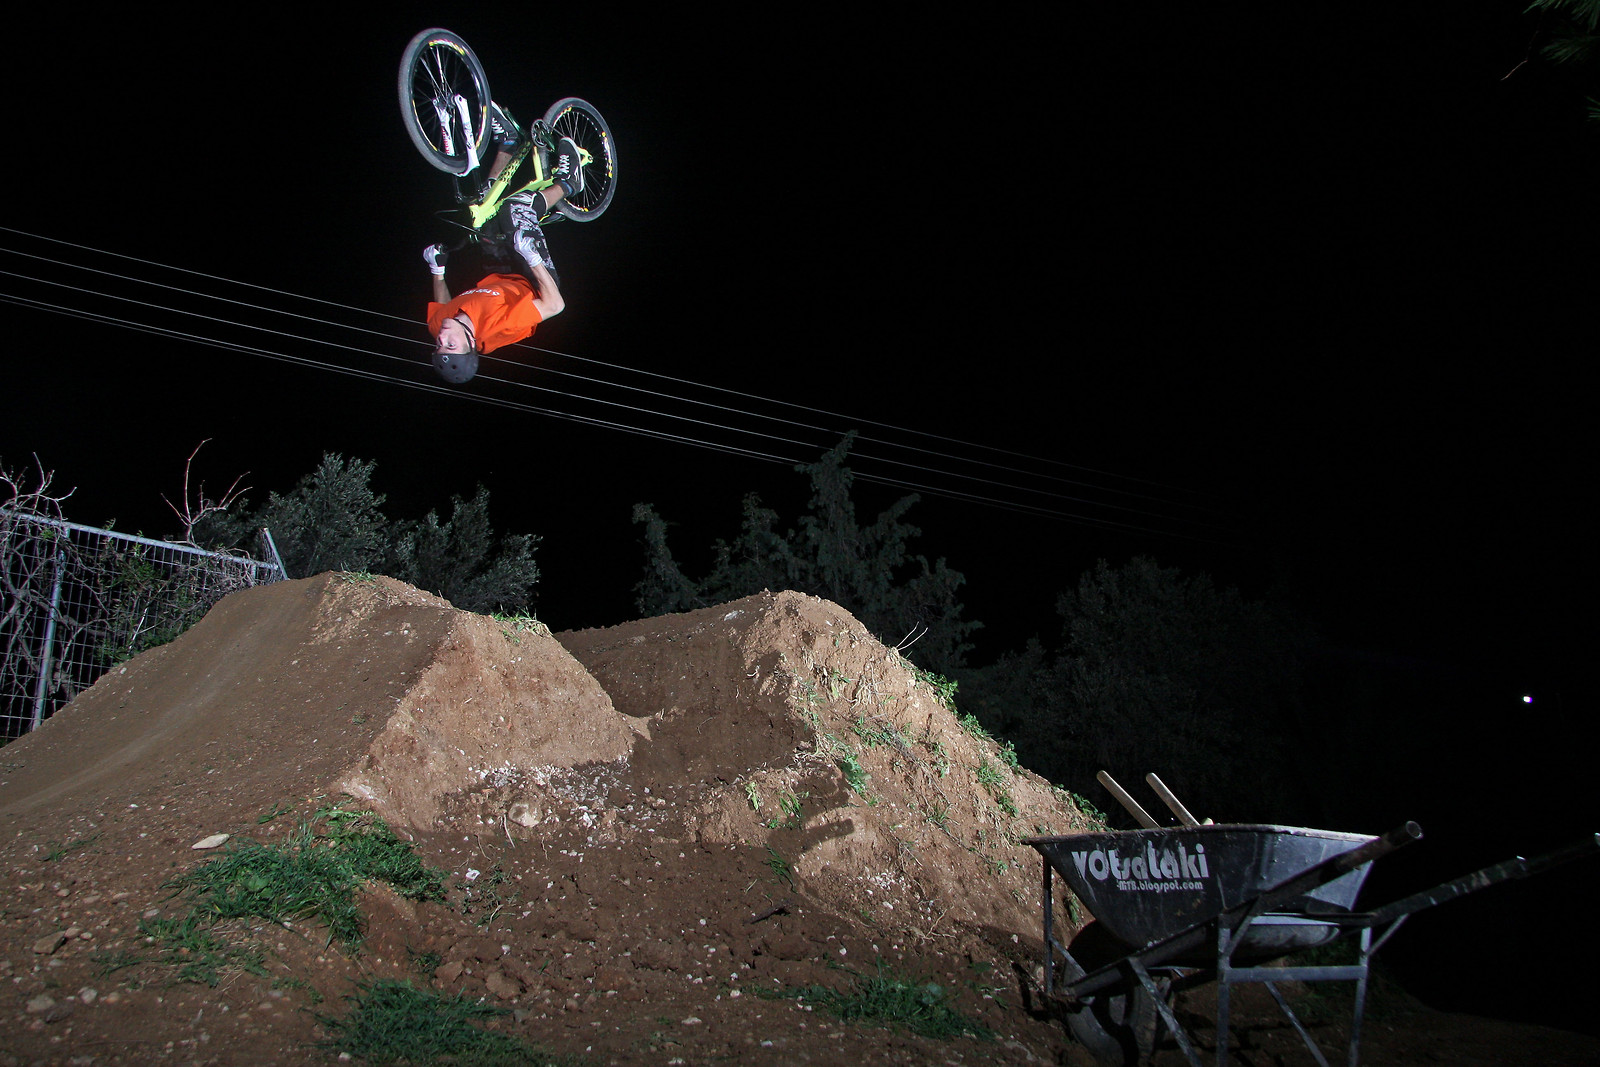 Kamil Backflip - pappoulakos - Mountain Biking Pictures - Vital MTB